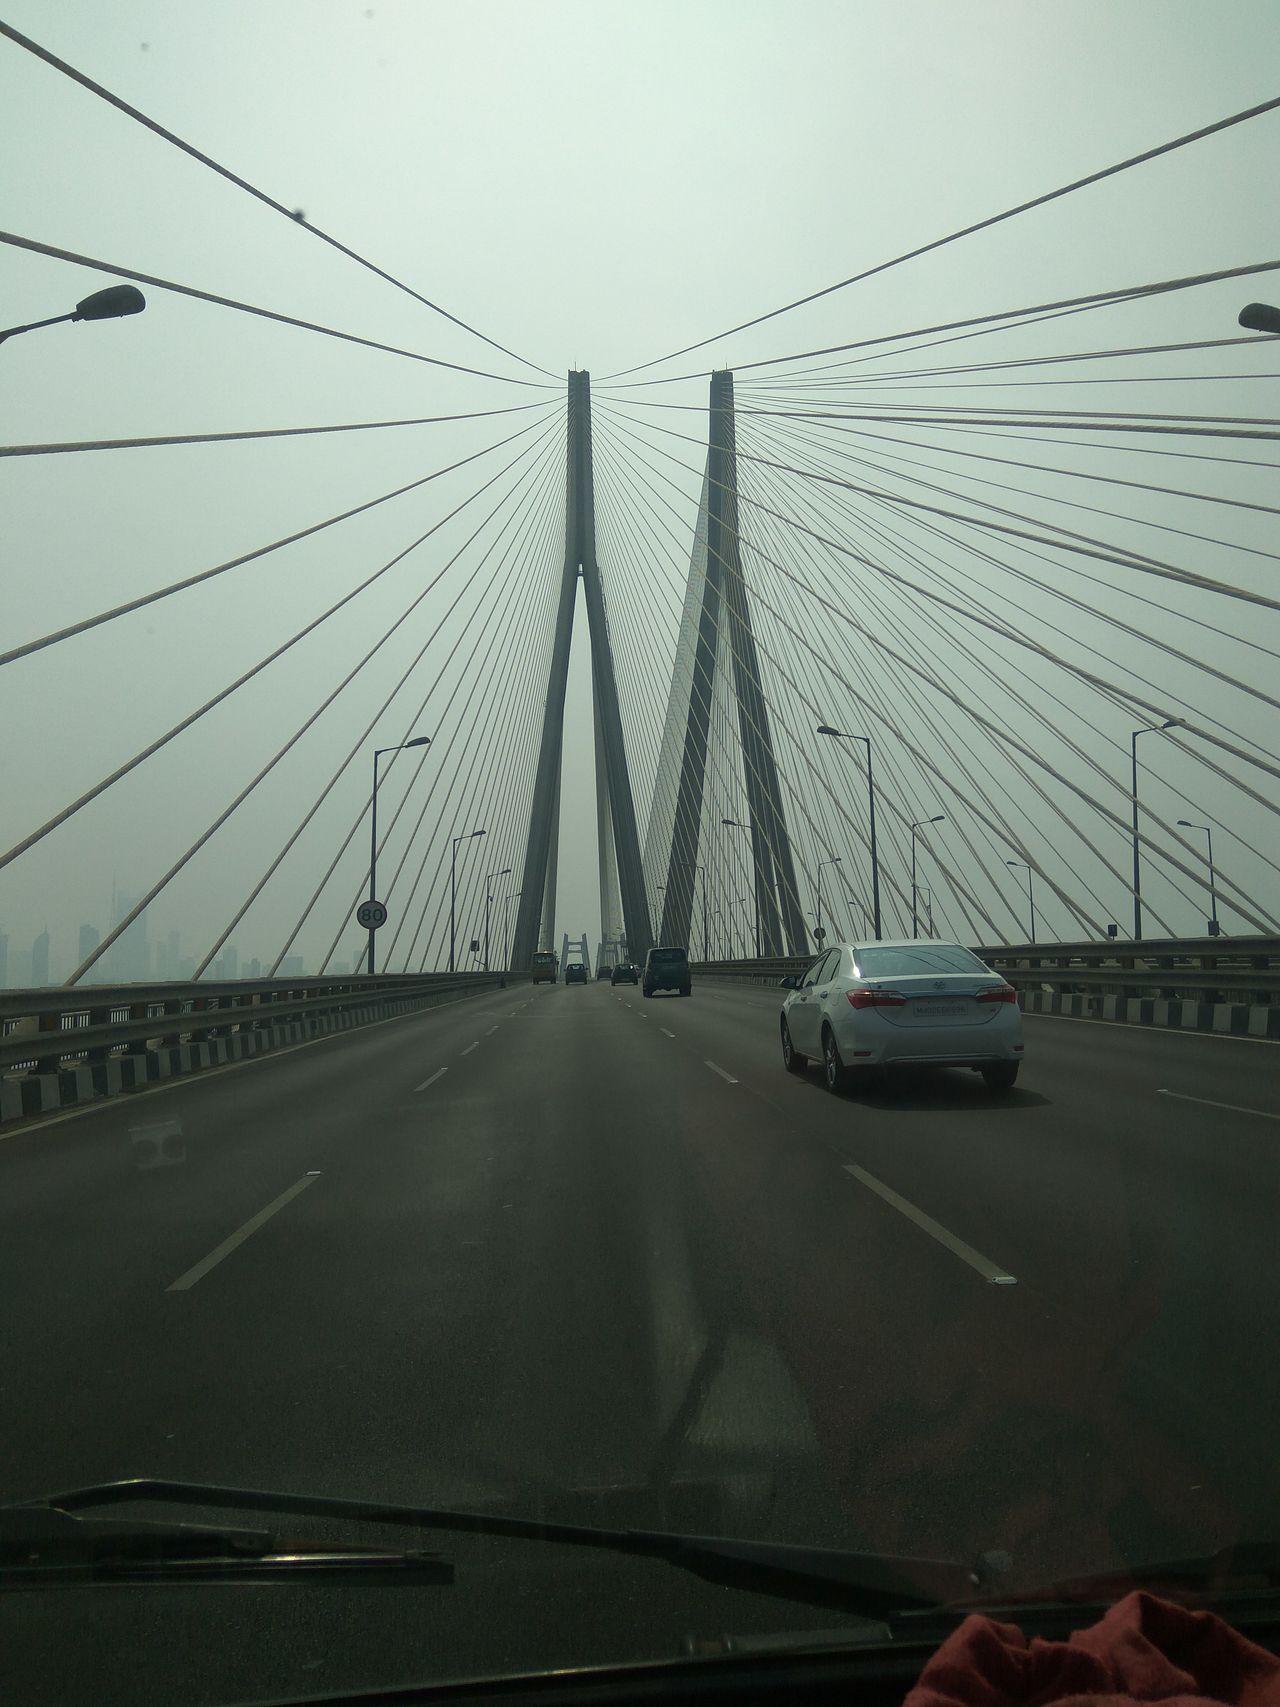 Cabile Car Interior Road Sign Sea Link Mumbai Sky